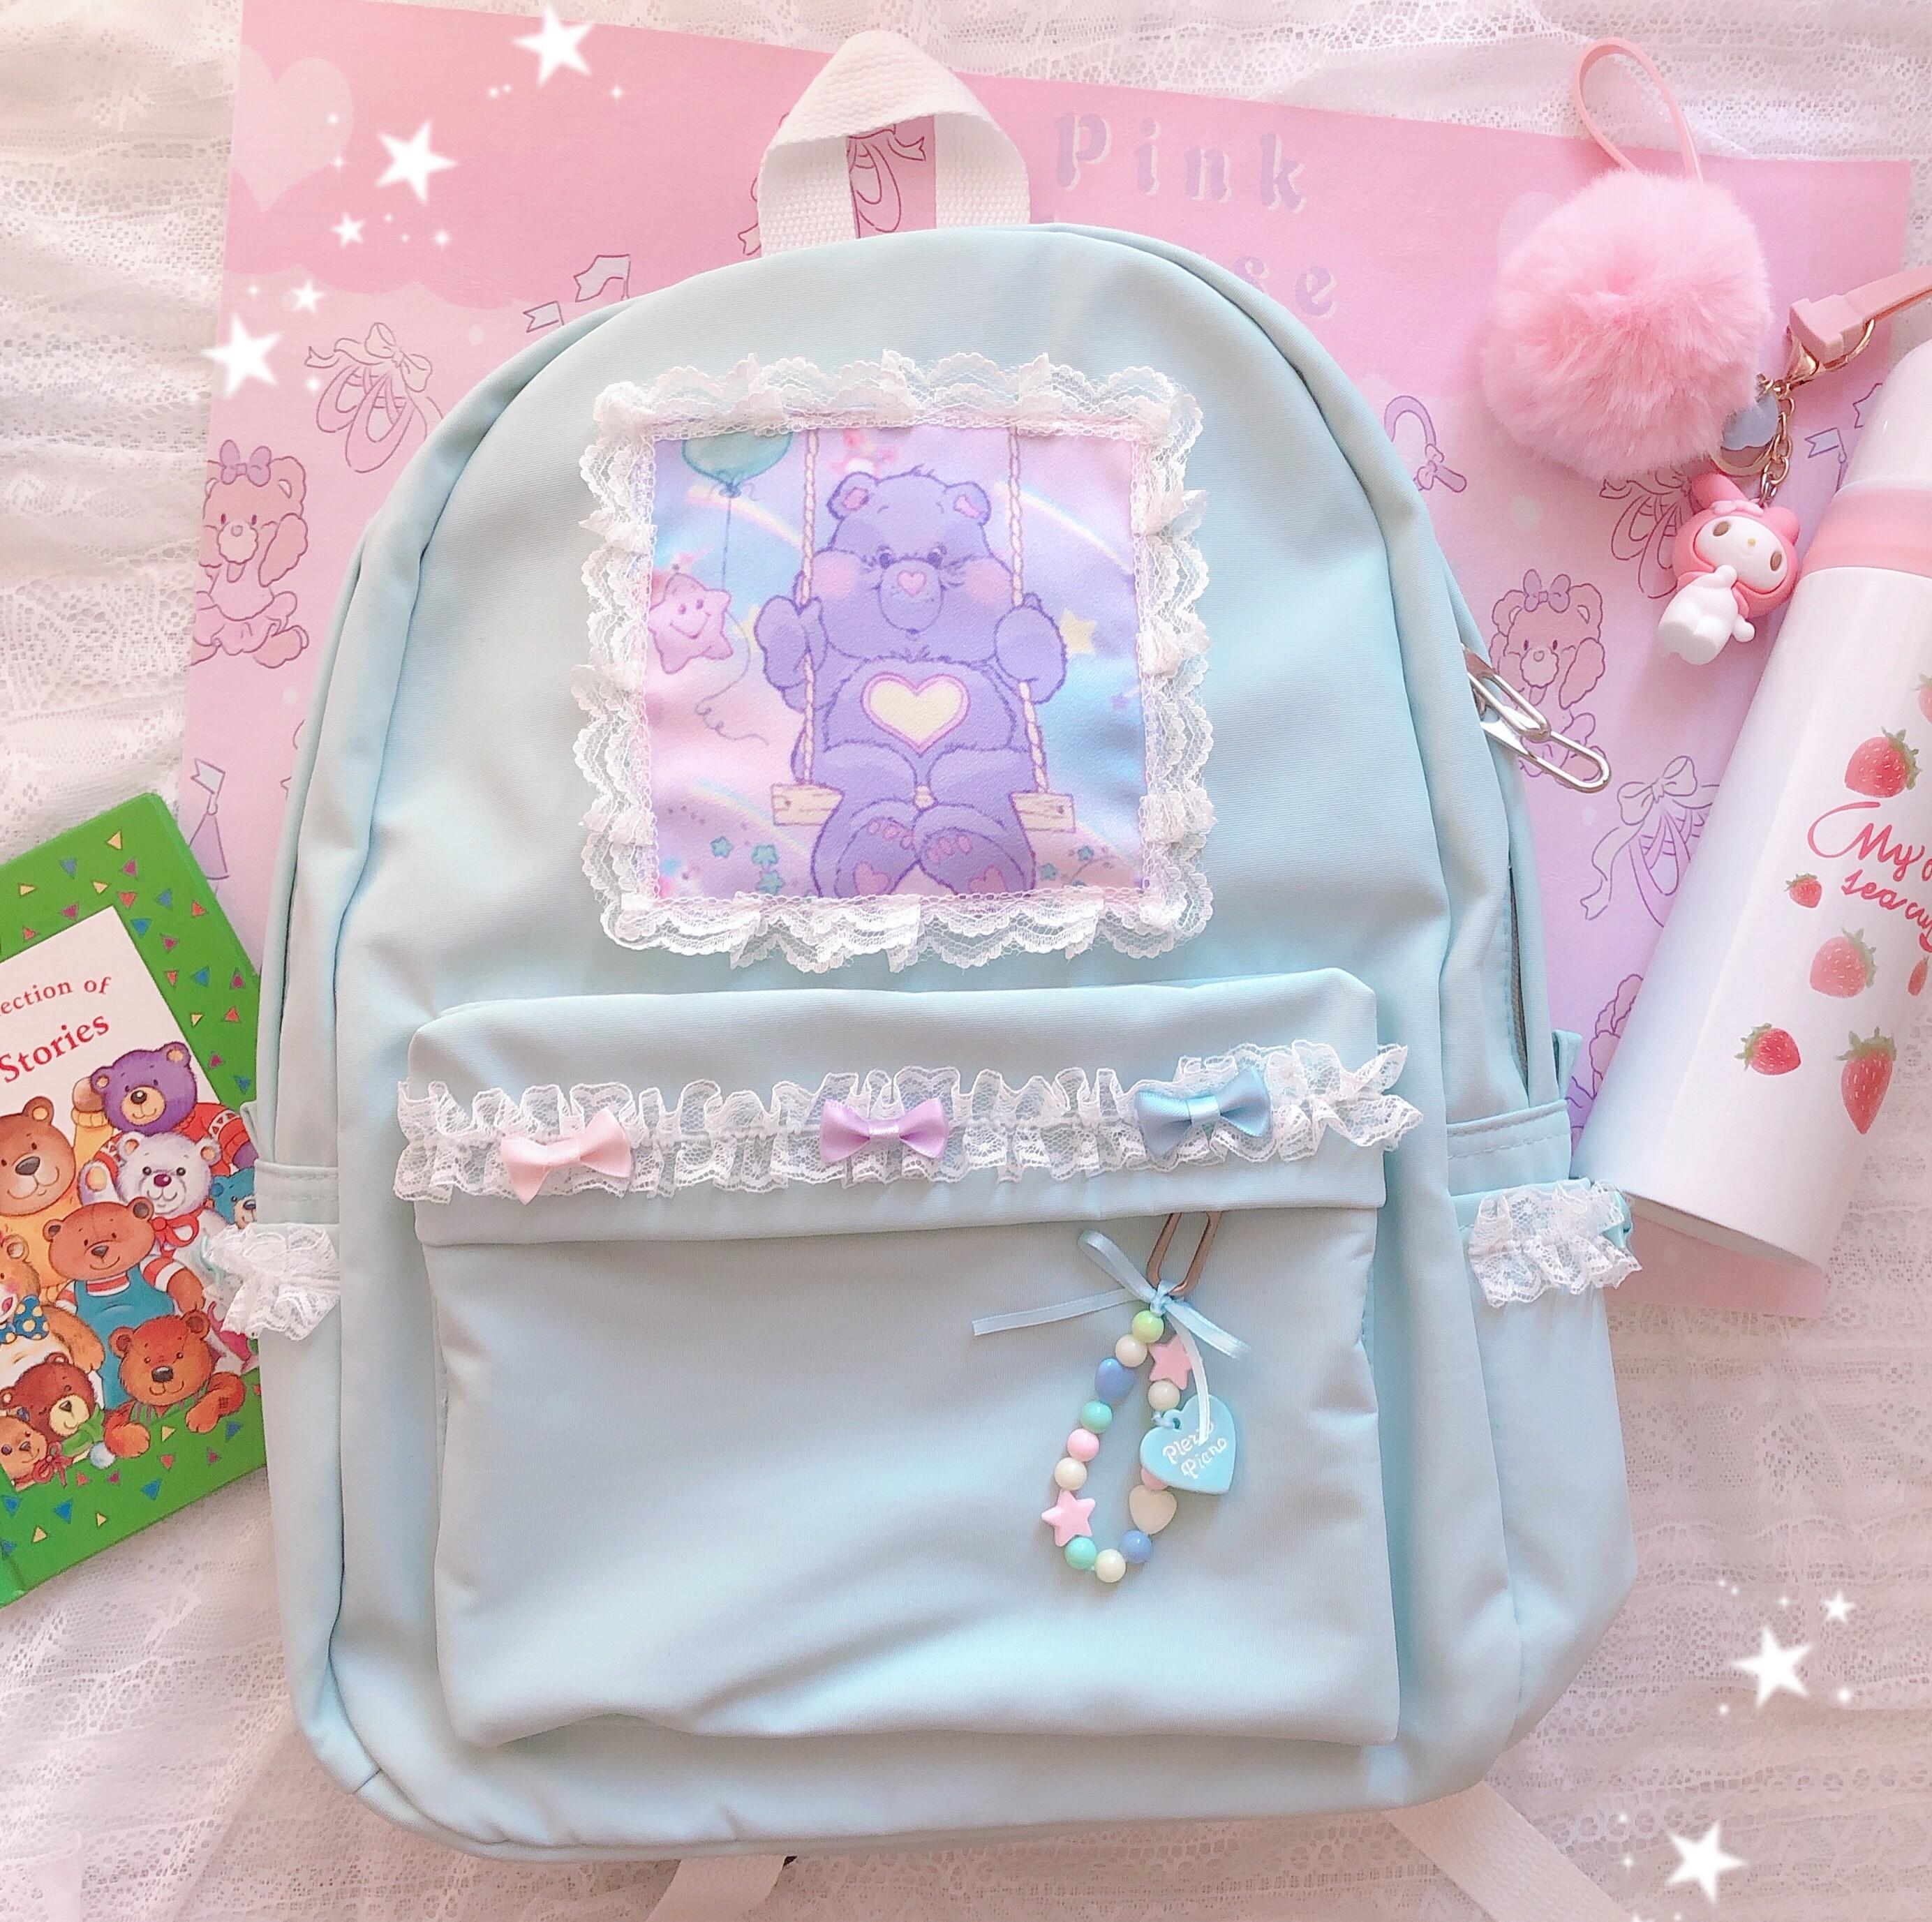 Student Young Girl Cute Bear Backpack Small Fresh Cartoon Bow Lace School Bag Ulzzang Harajuku Sof Girl Shoulders Bag Handbag